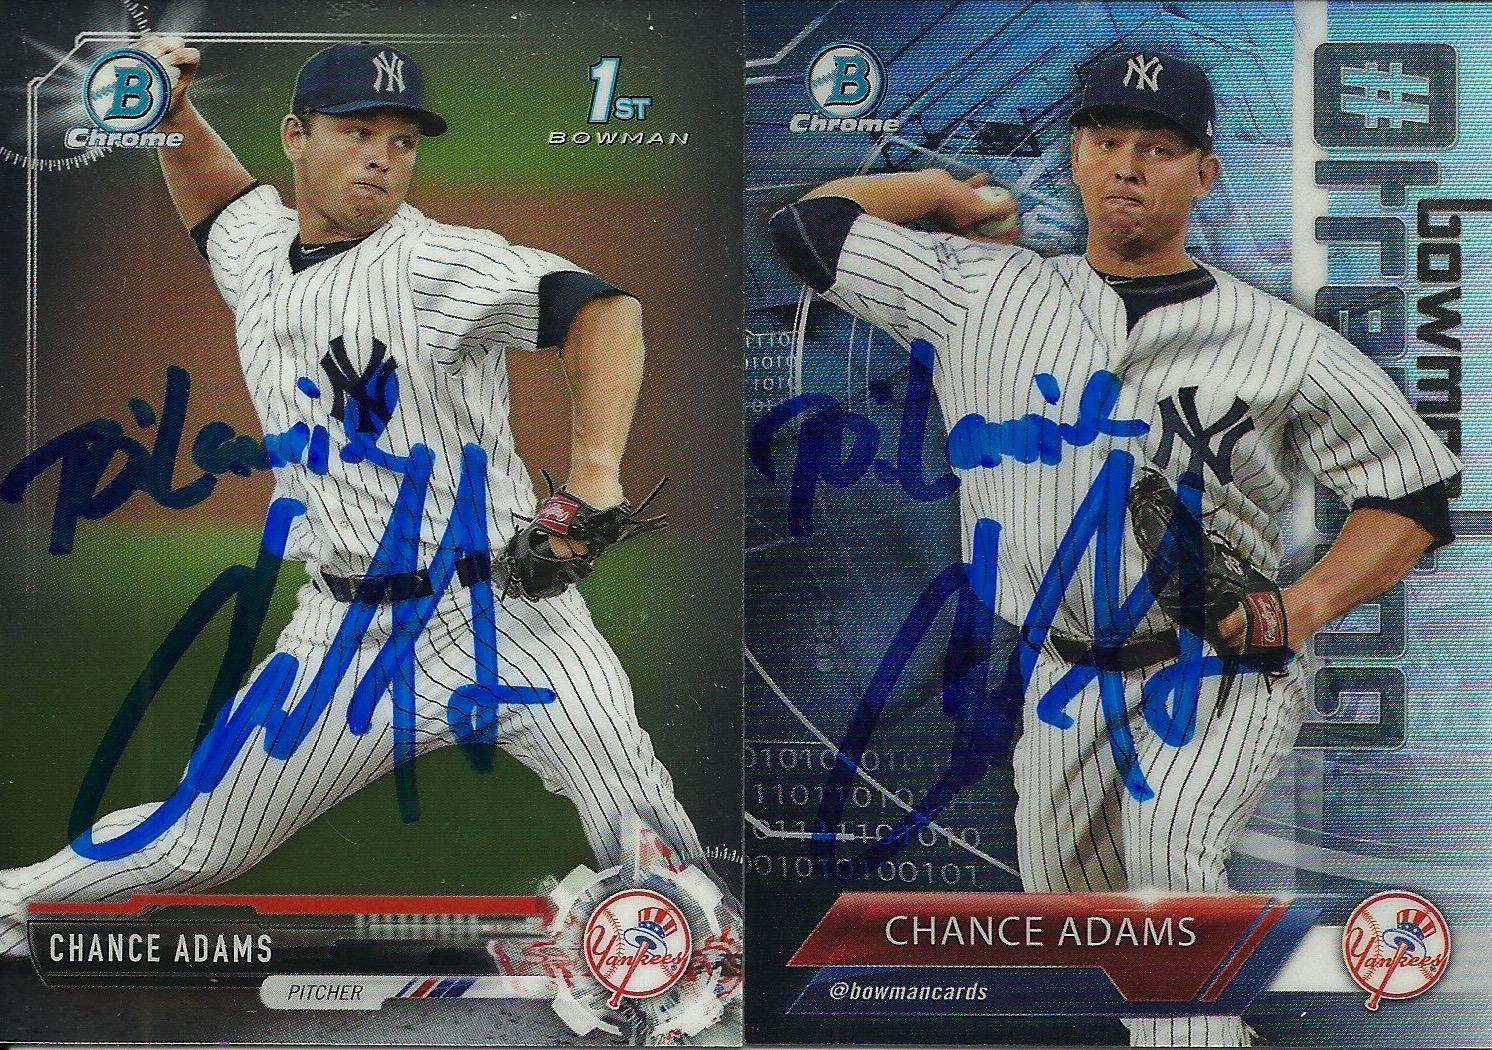 Lvs Ttm Autographs And Baseball Cards Chance Adams